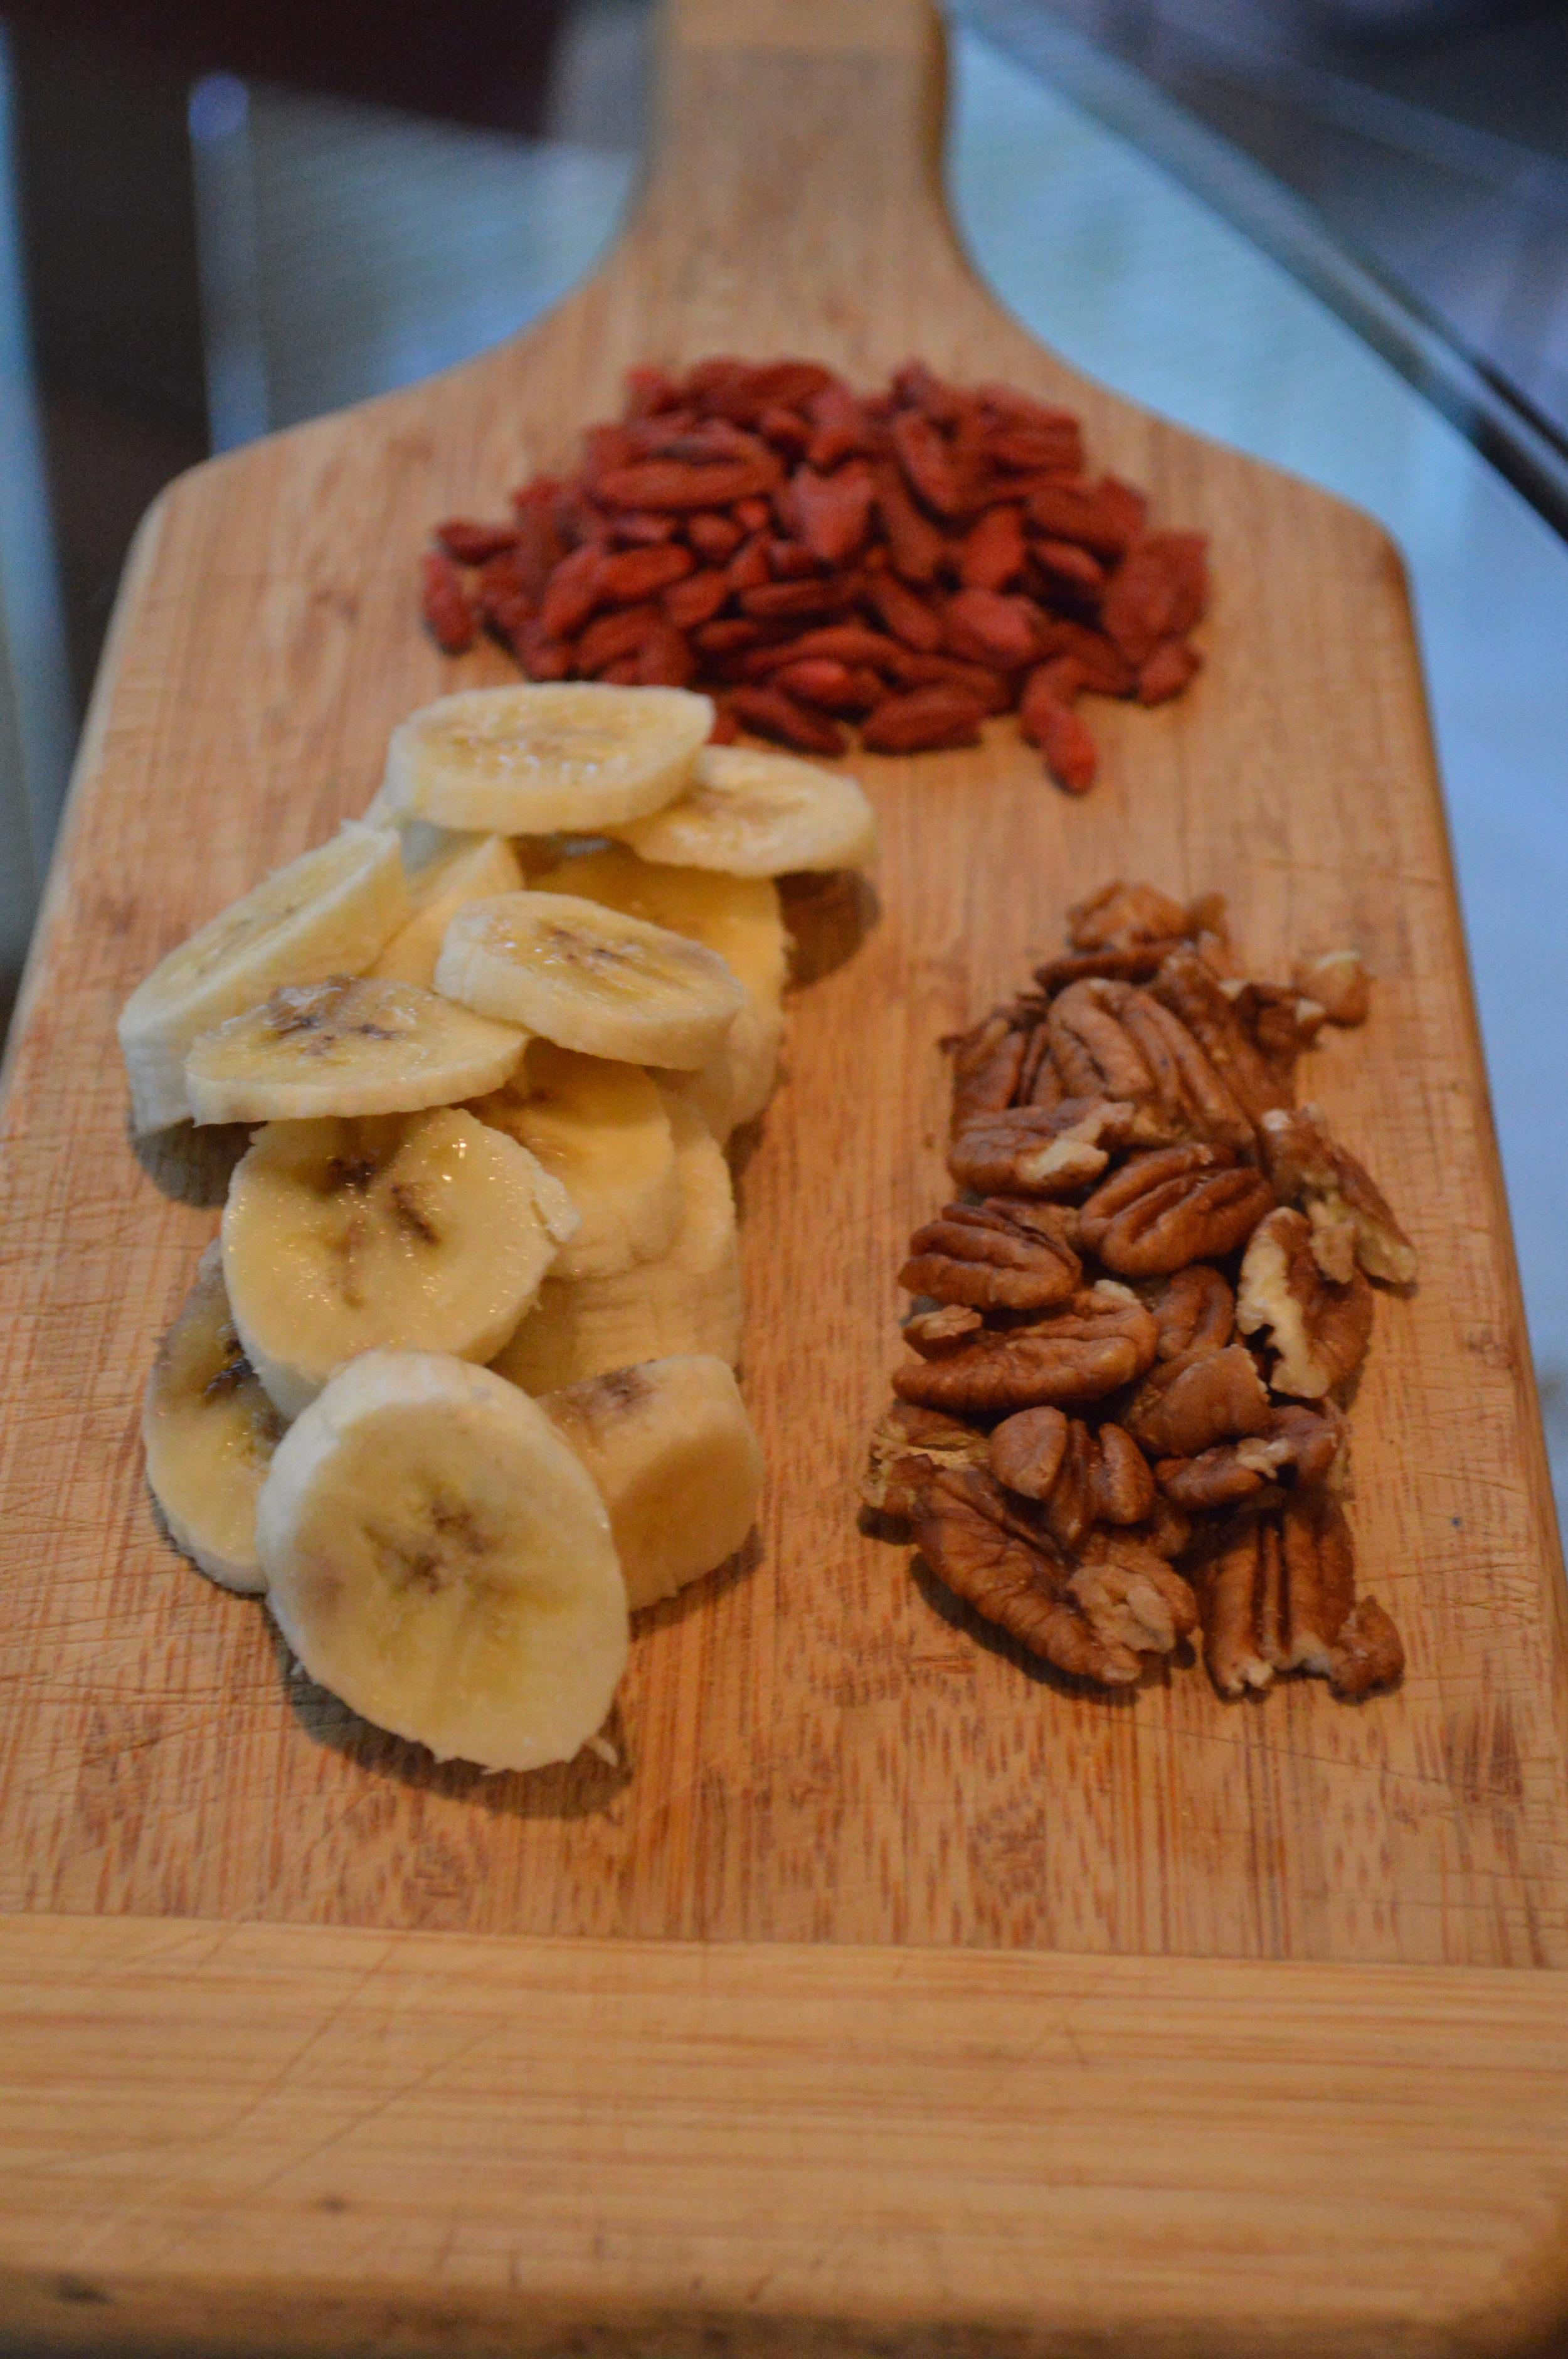 Oatmeal Toppings | Goji Berries, Banana, Pecans